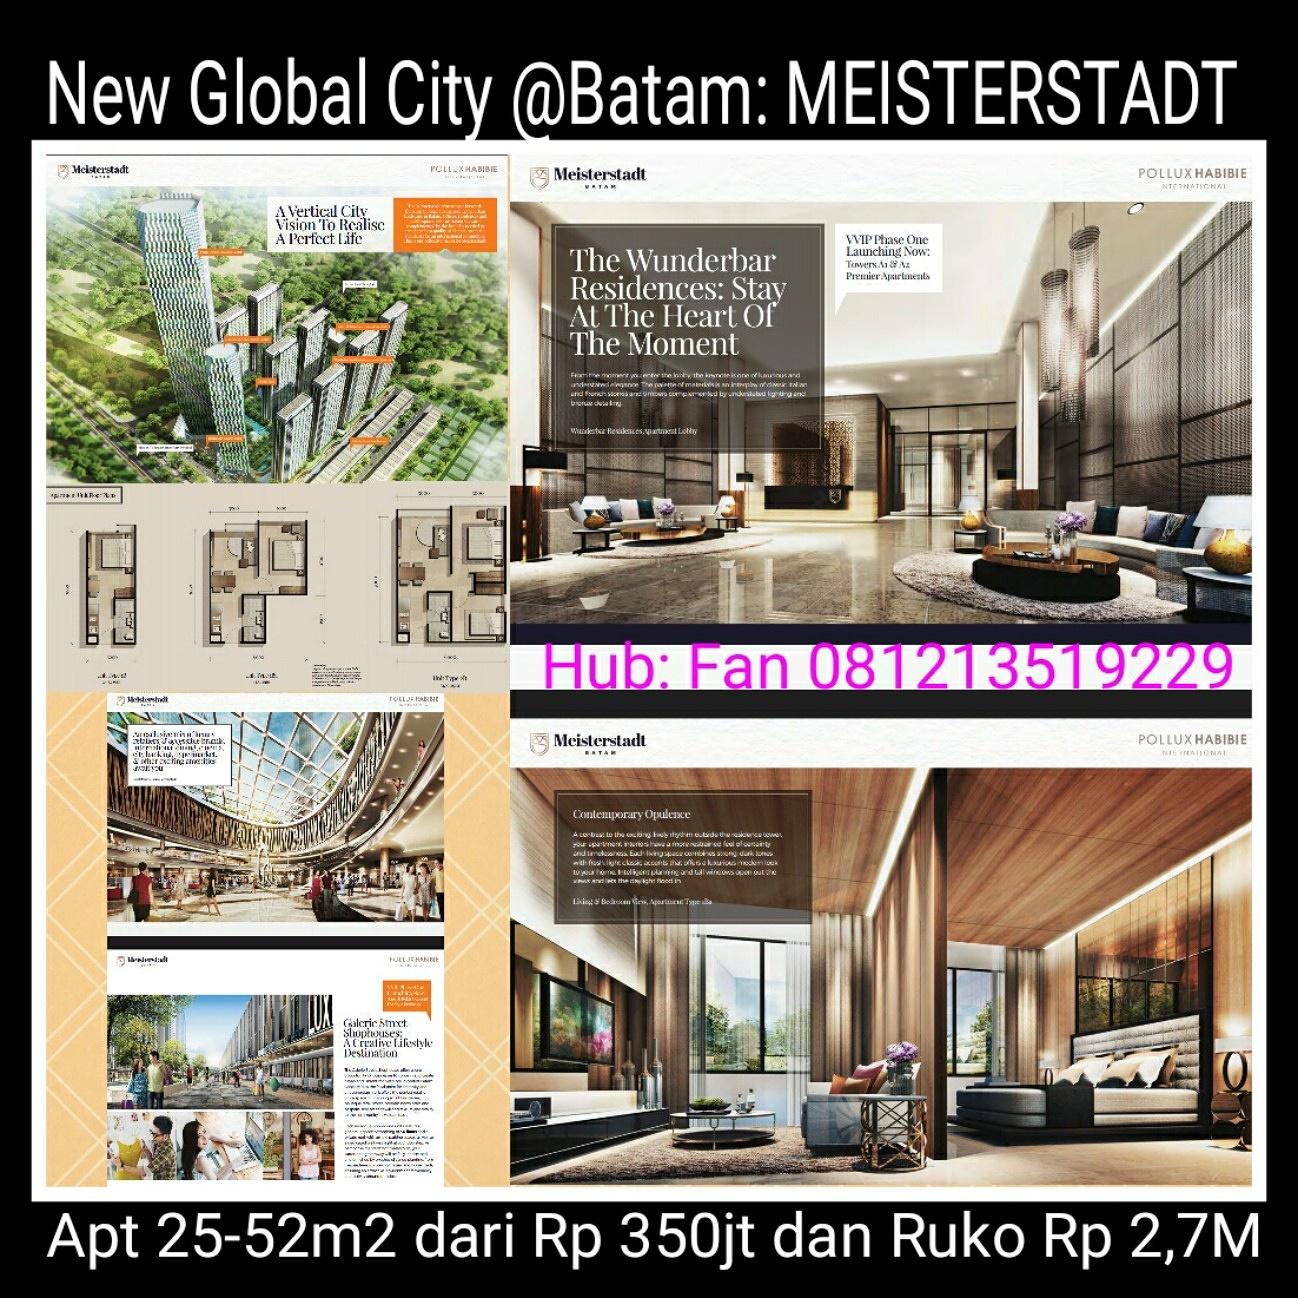 Apartment & Ruko Meisterstadt Batam 2